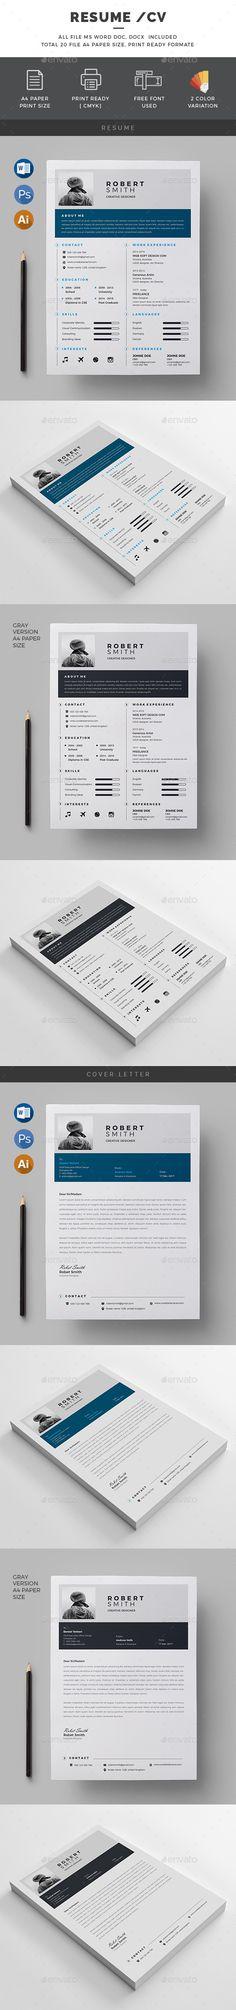 #Resume/CV - Resumes Stationery Download here: https://graphicriver.net/item/resumecv/19534101?ref=alena994